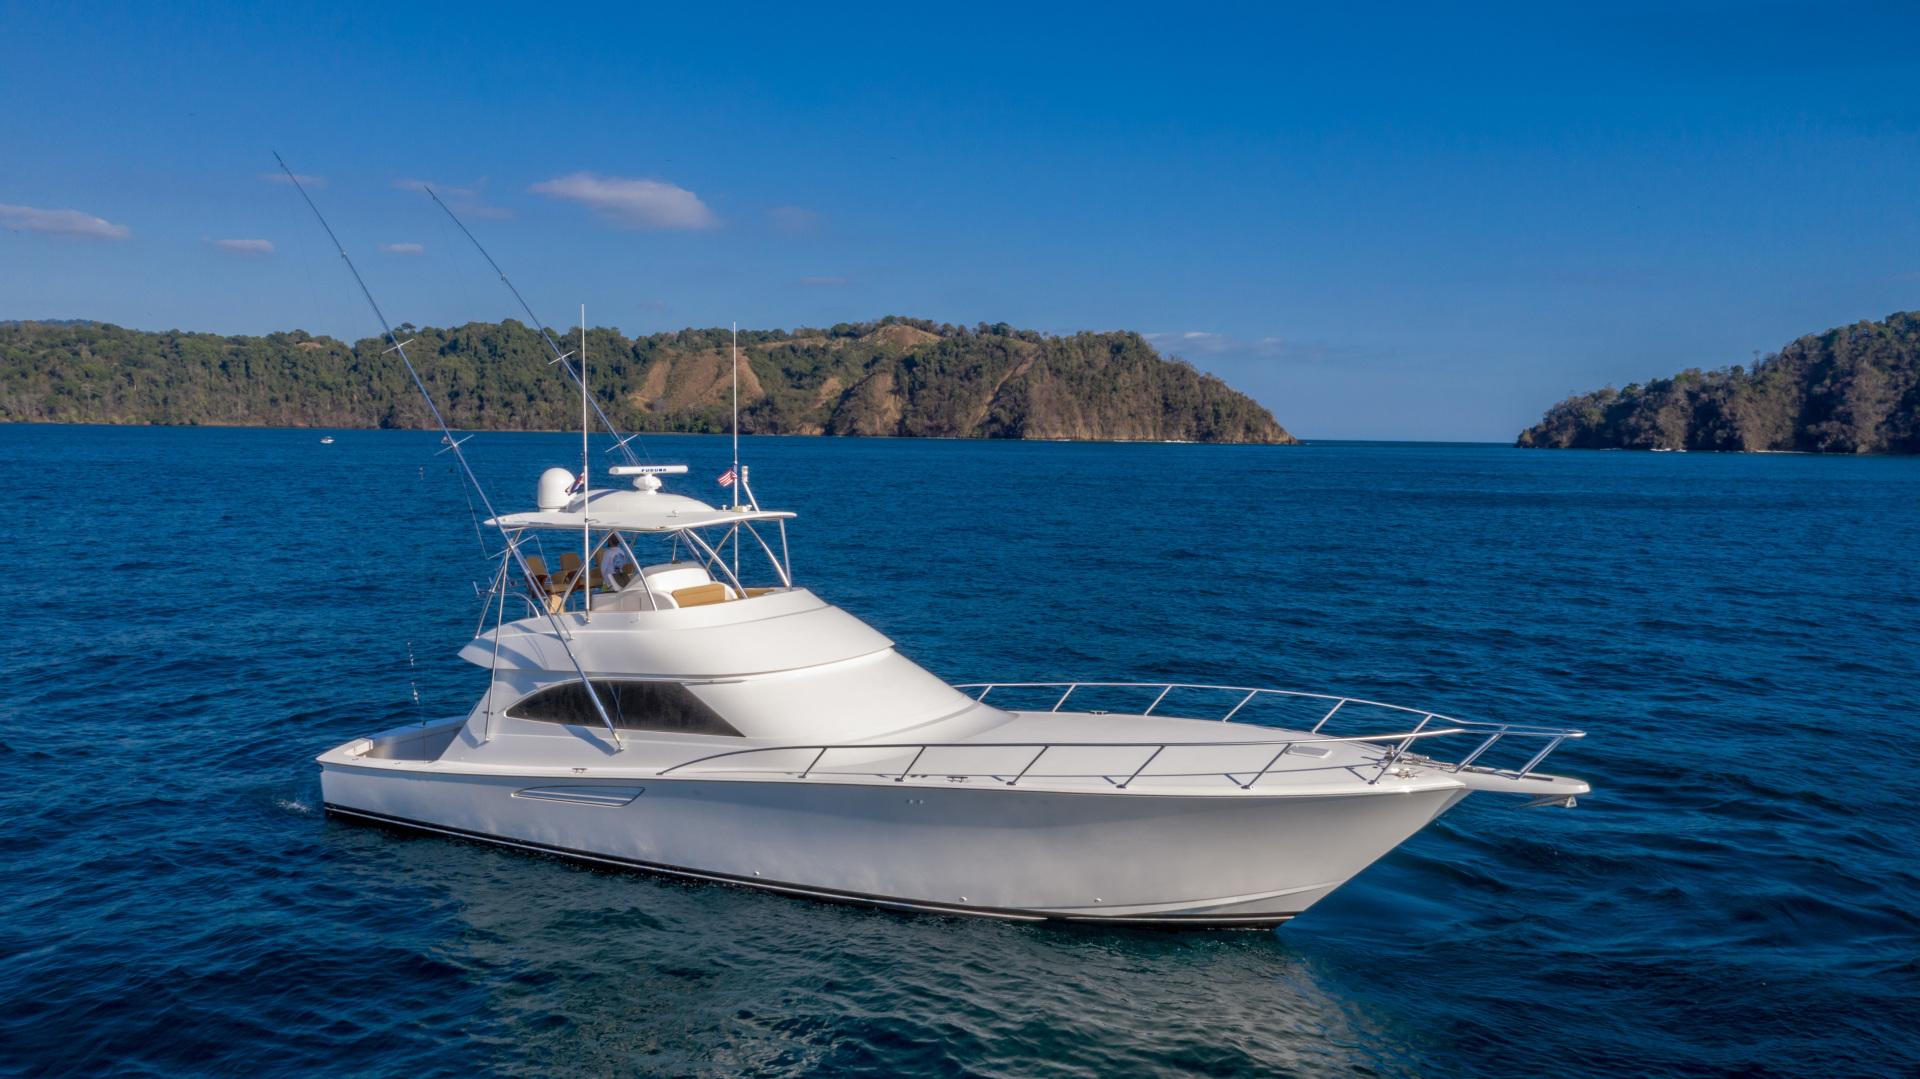 Viking-62 Convertible 2014-Mixer Playa Herradura, Los Suenos,-Costa Rica-2014 Viking 62 Convertible  Starboard Profile-1356266 | Thumbnail